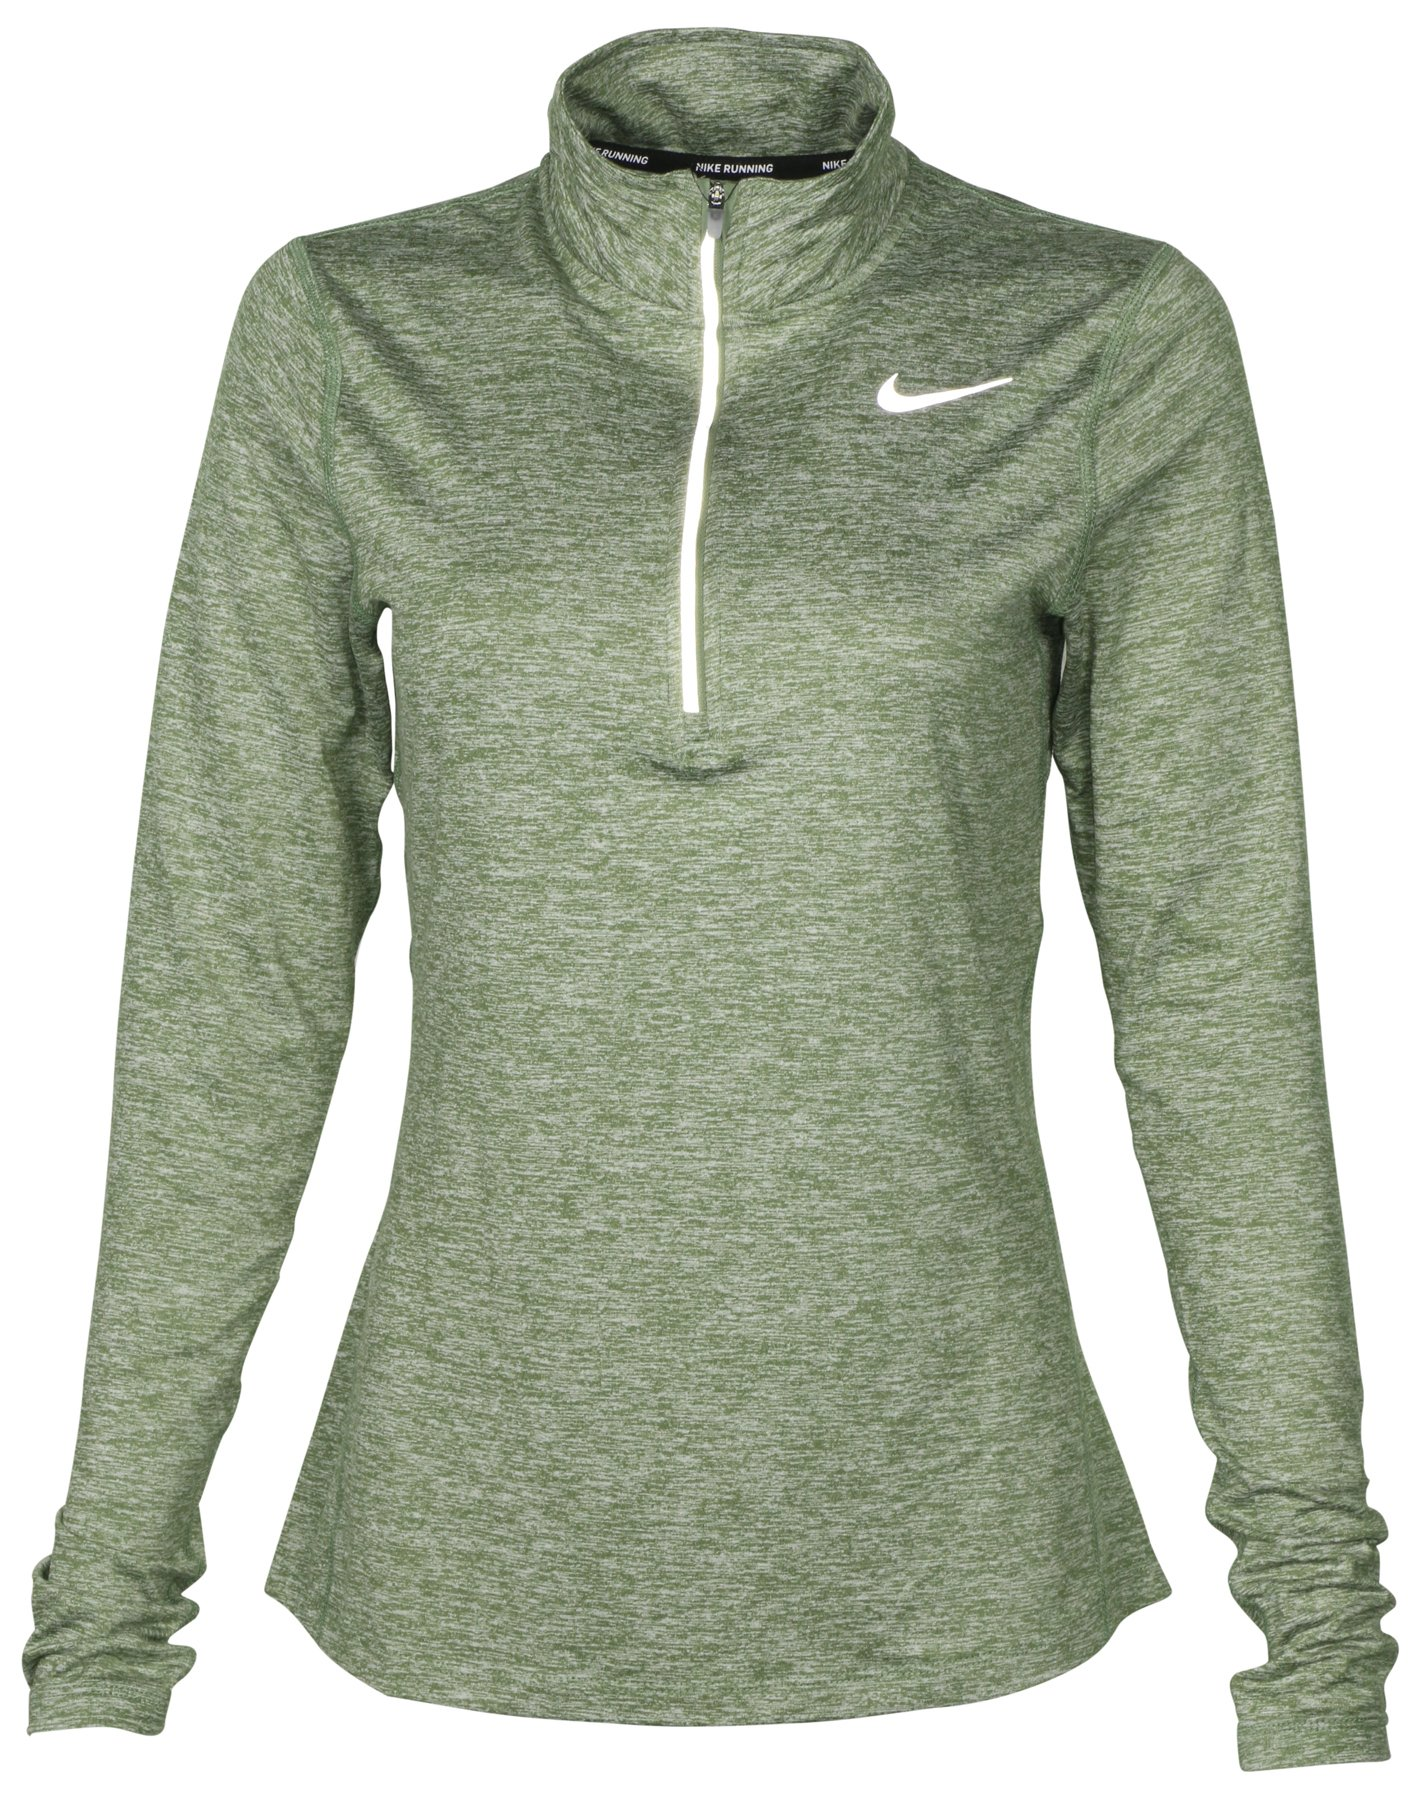 5ebe3afdc428f Galleon - NIKE Women s Dri-Fit Running 1 2 Zip Shirt Green 904900 300 (XS)